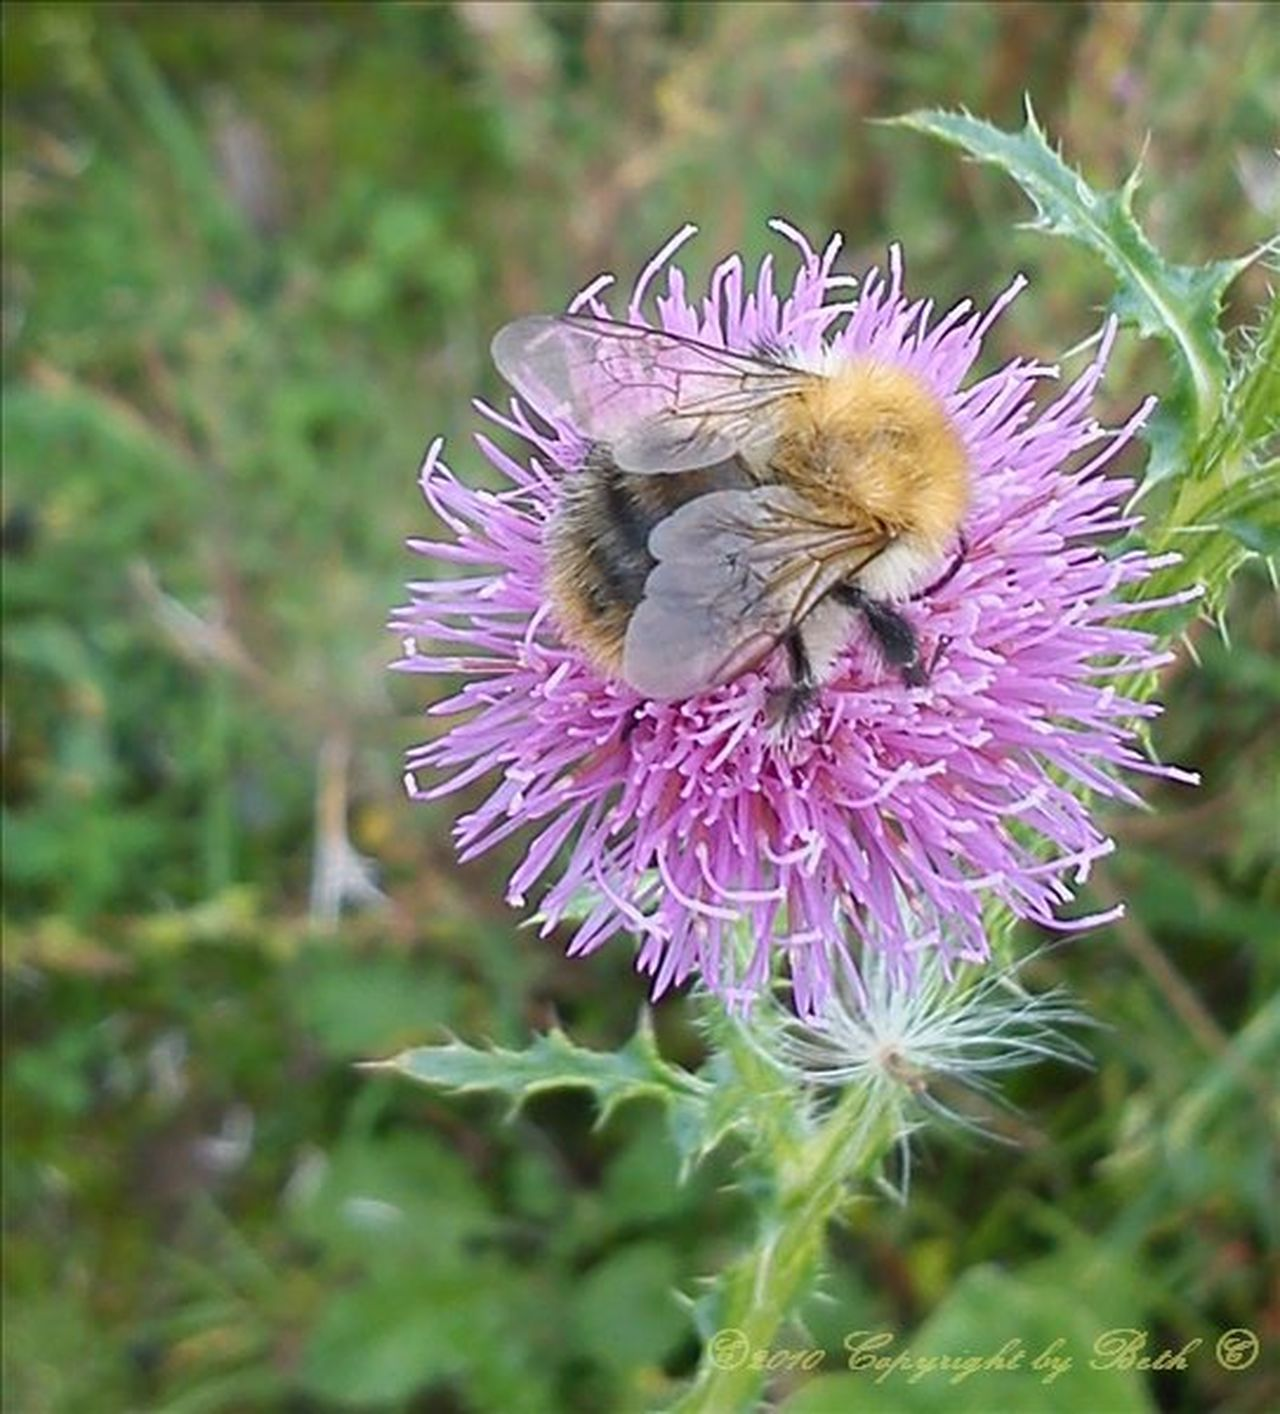 Babybiene🌾 Biene Blumenpracht🌺🍃 Blume-biene🌾 Check This Out Hello World Hi! Mobileflowers